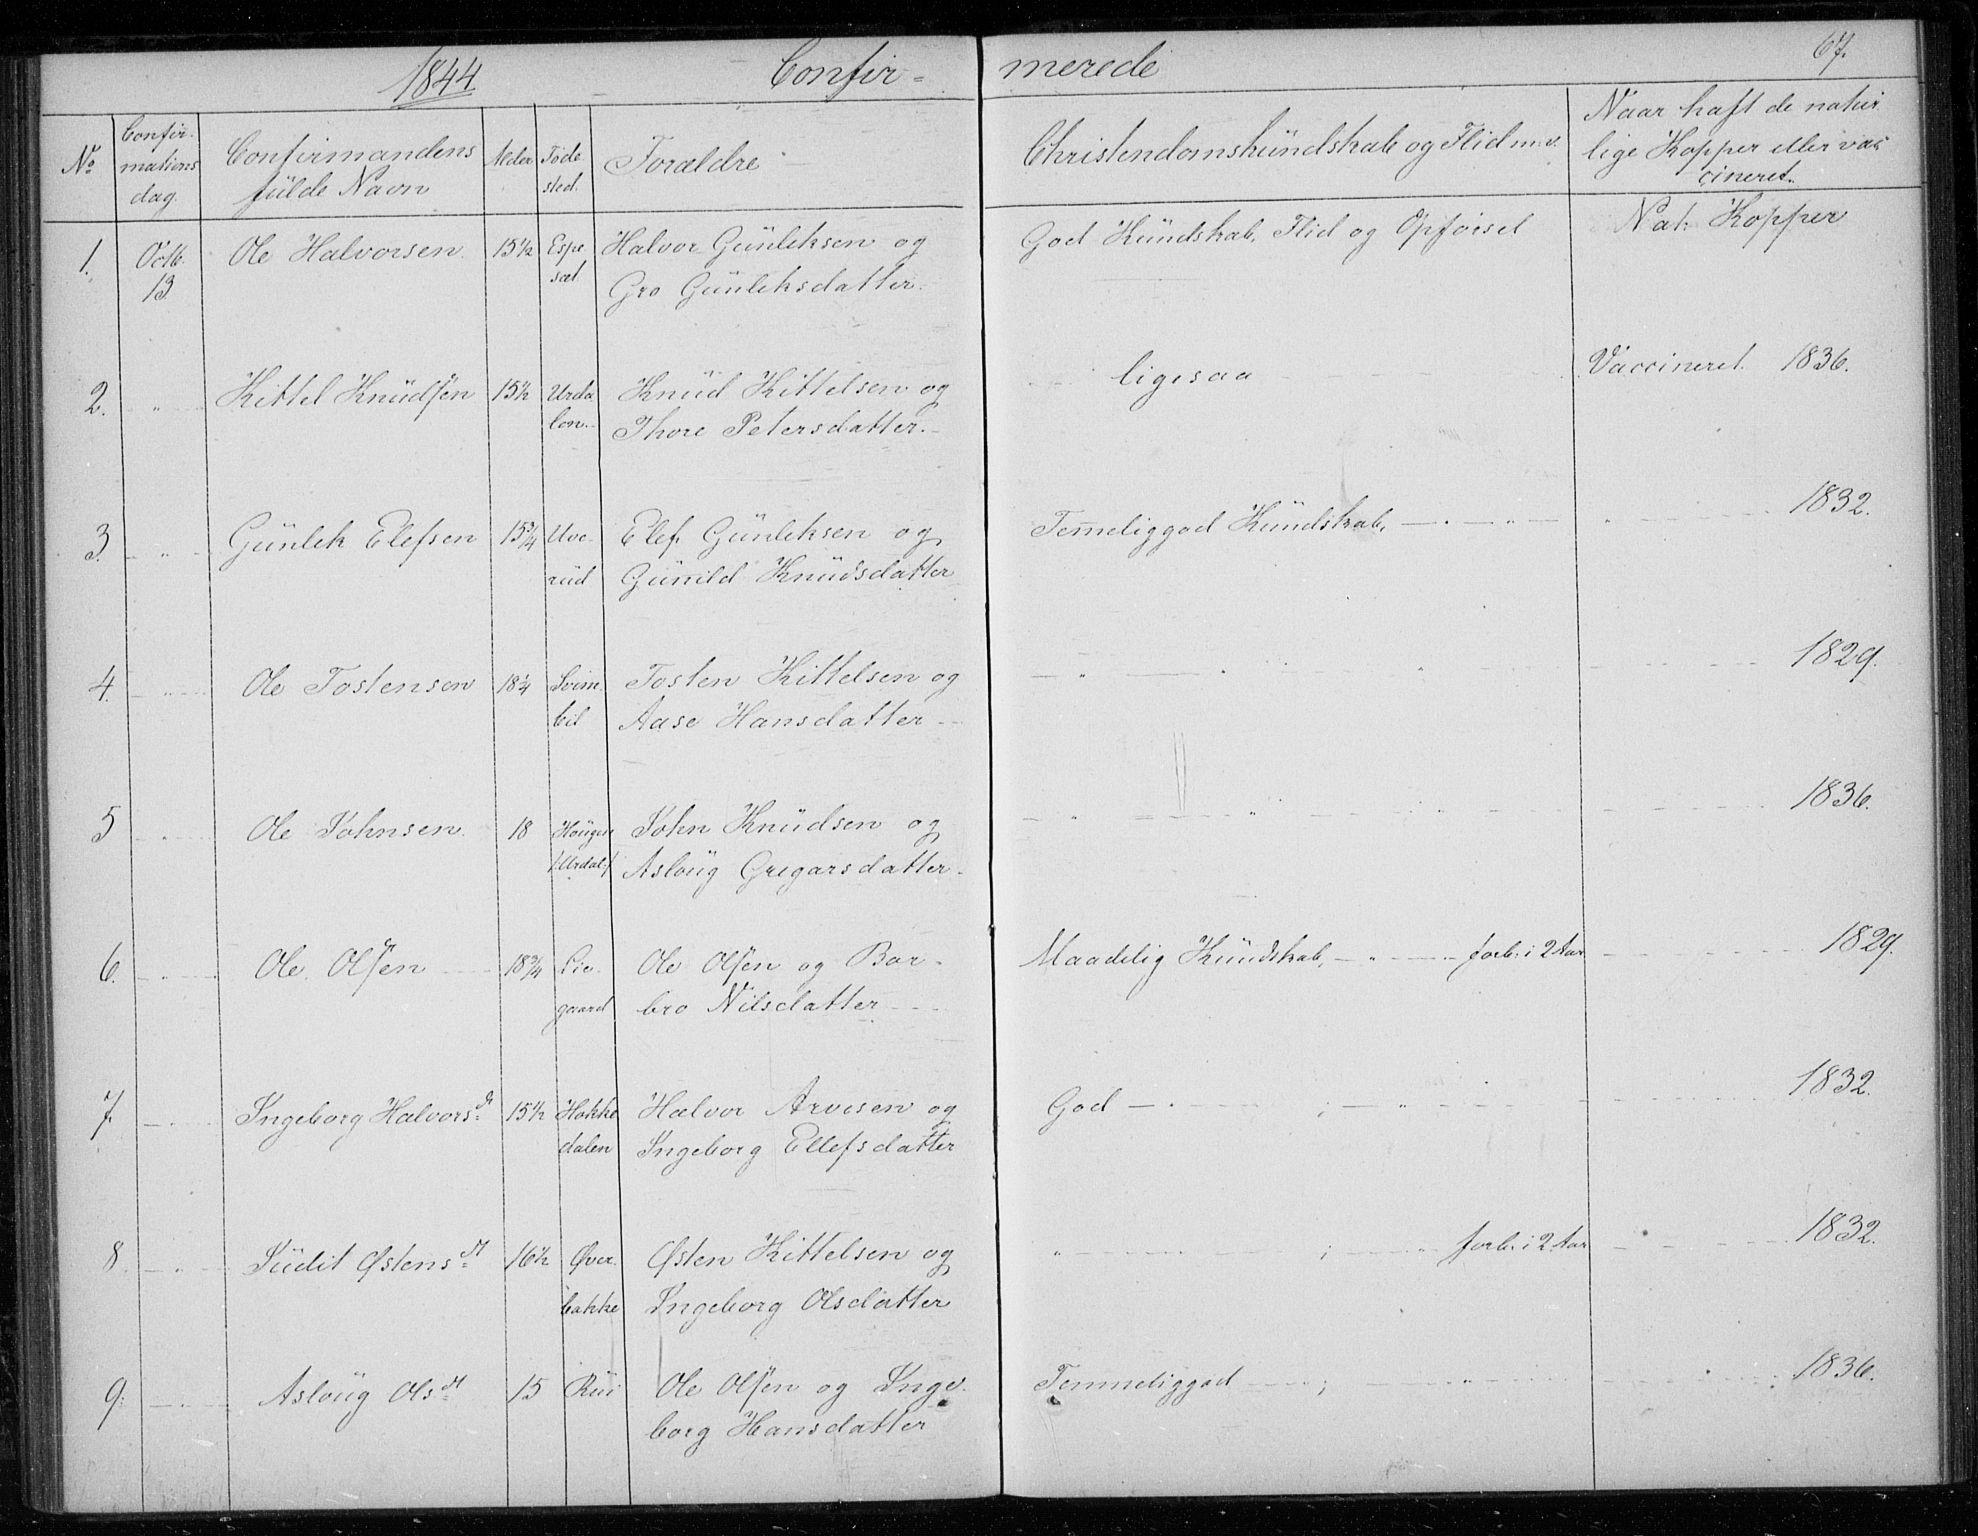 SAKO, Gransherad kirkebøker, F/Fb/L0003: Ministerialbok nr. II 3, 1844-1859, s. 67